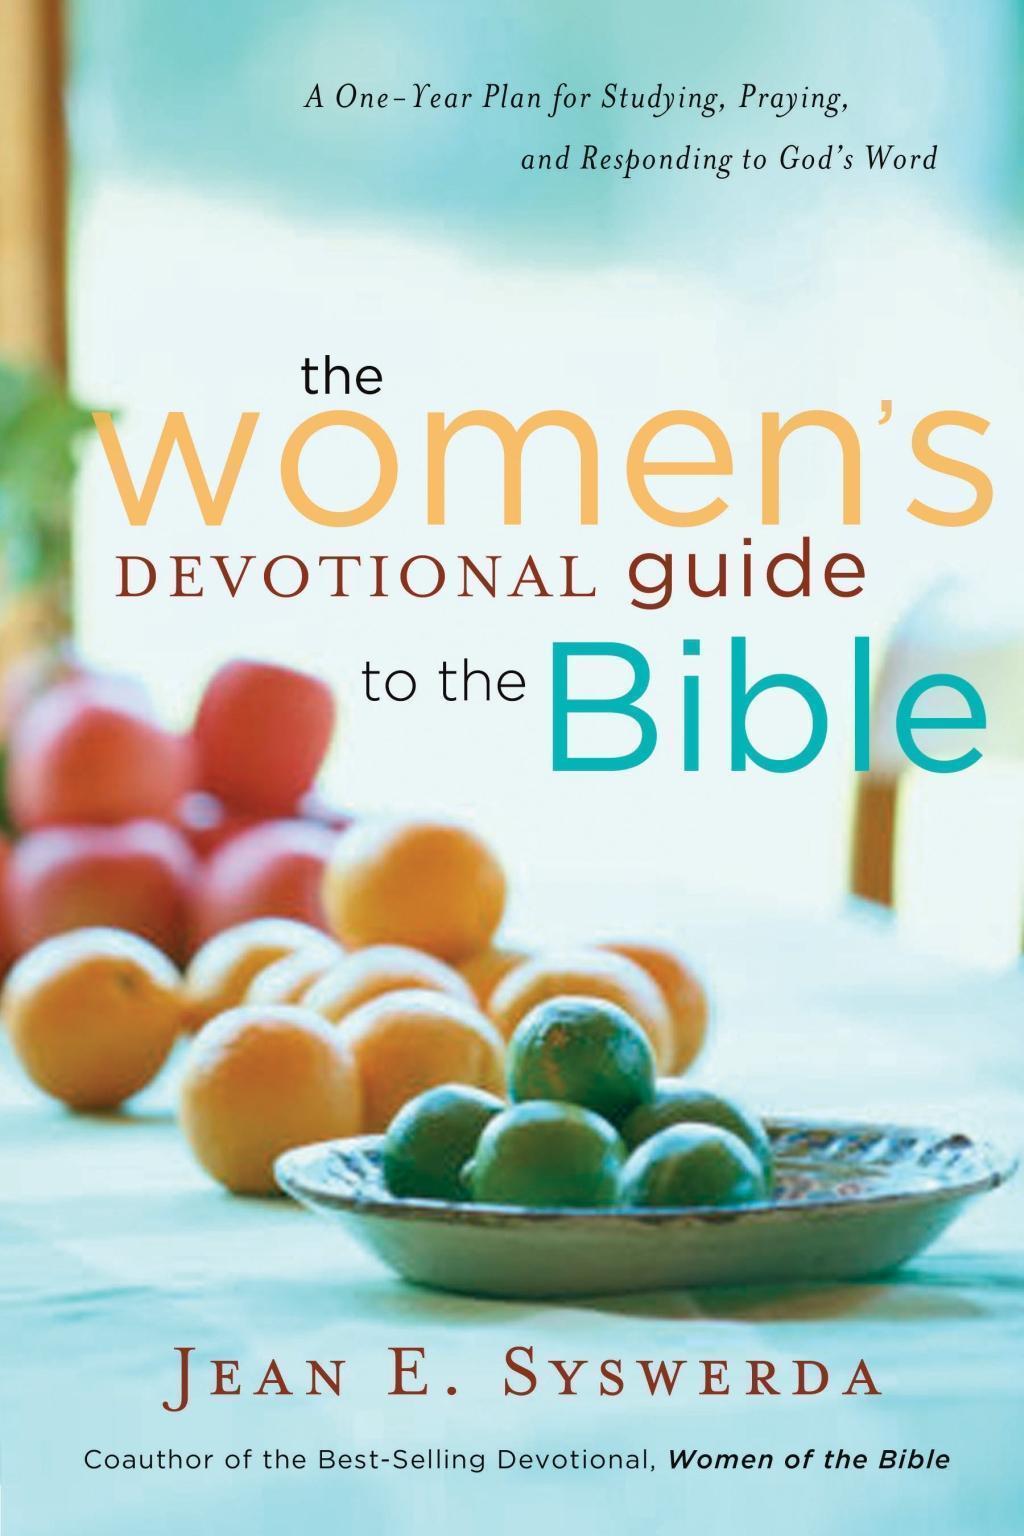 The Women's Devotional Guide to Bible